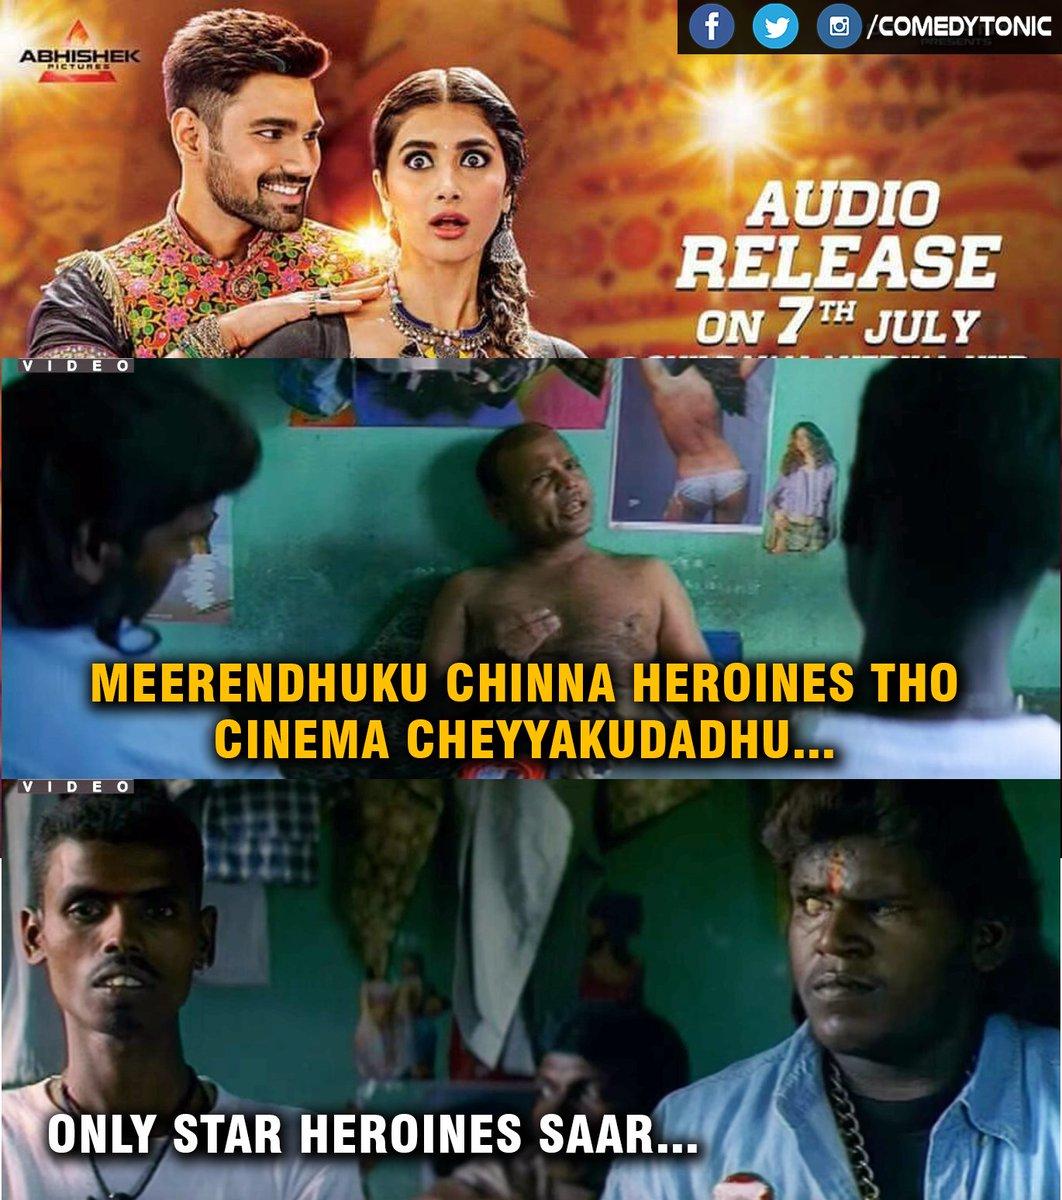 Comedy Tonic Telugu on Twitter: